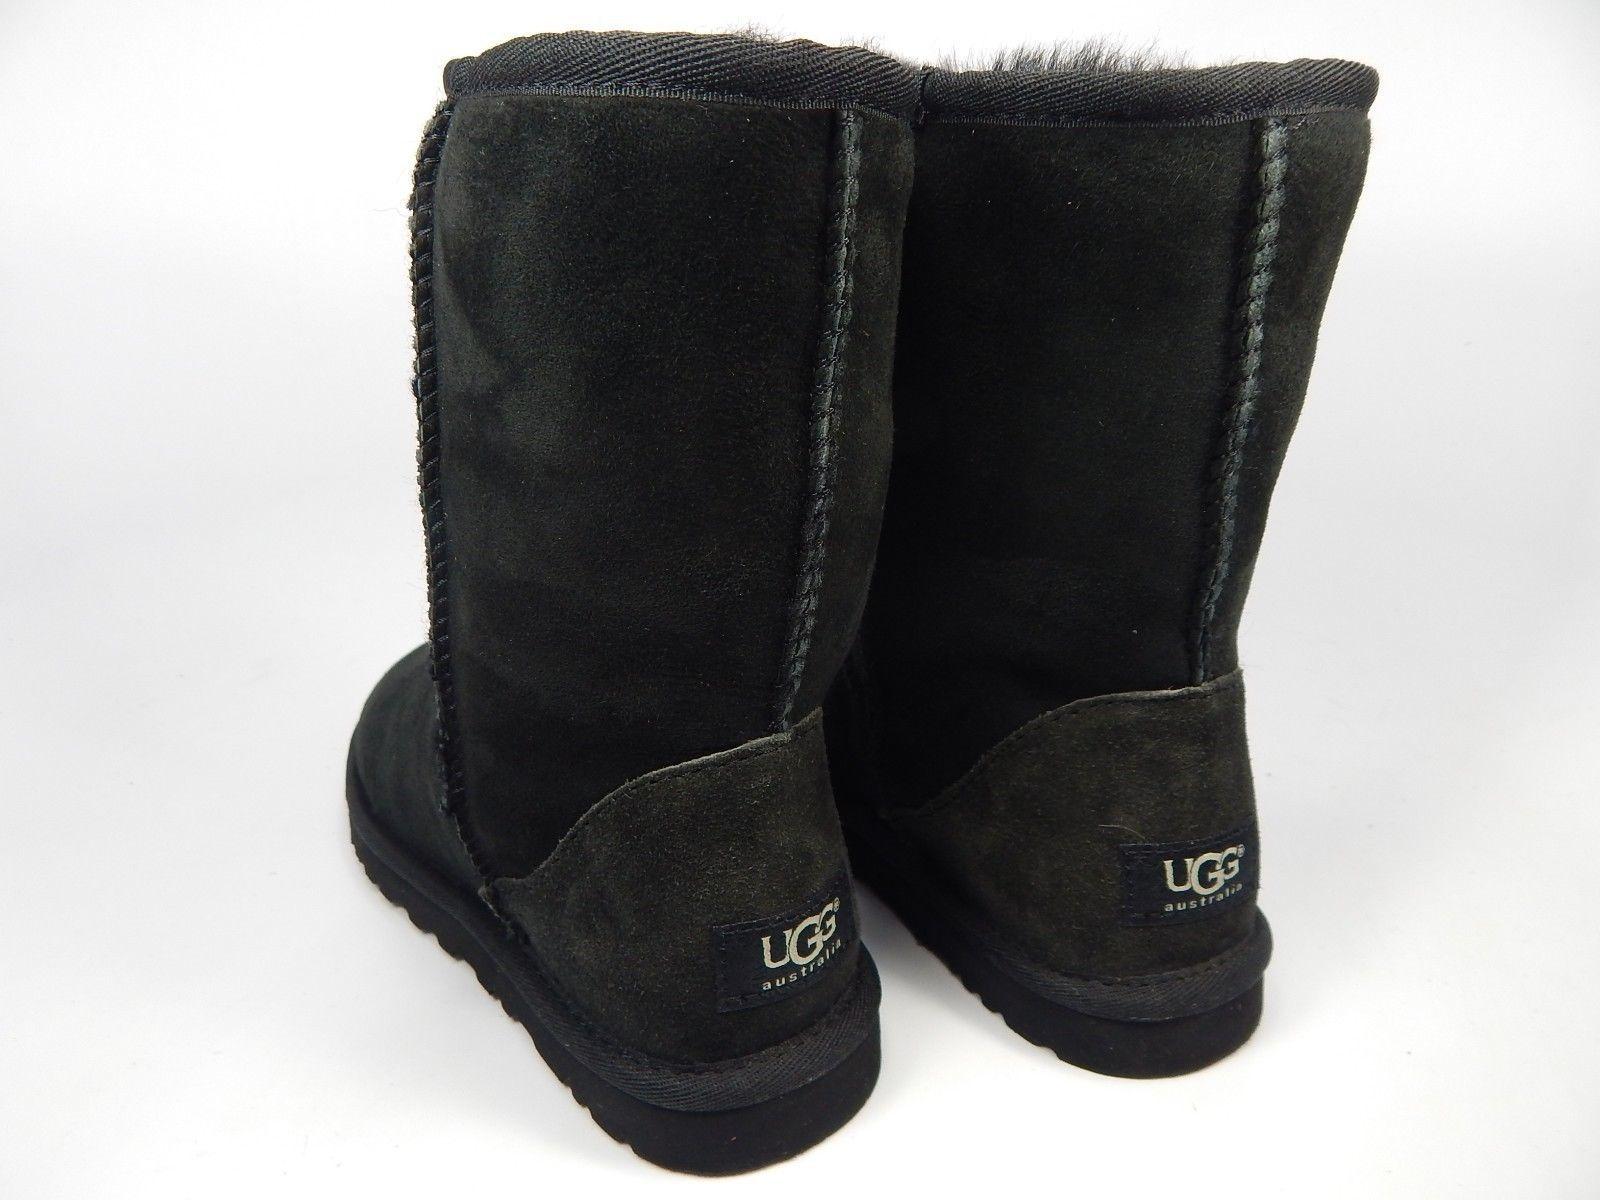 ffd21a87557 UGG Australia Classic Short Sheepskin Black and 50 similar items